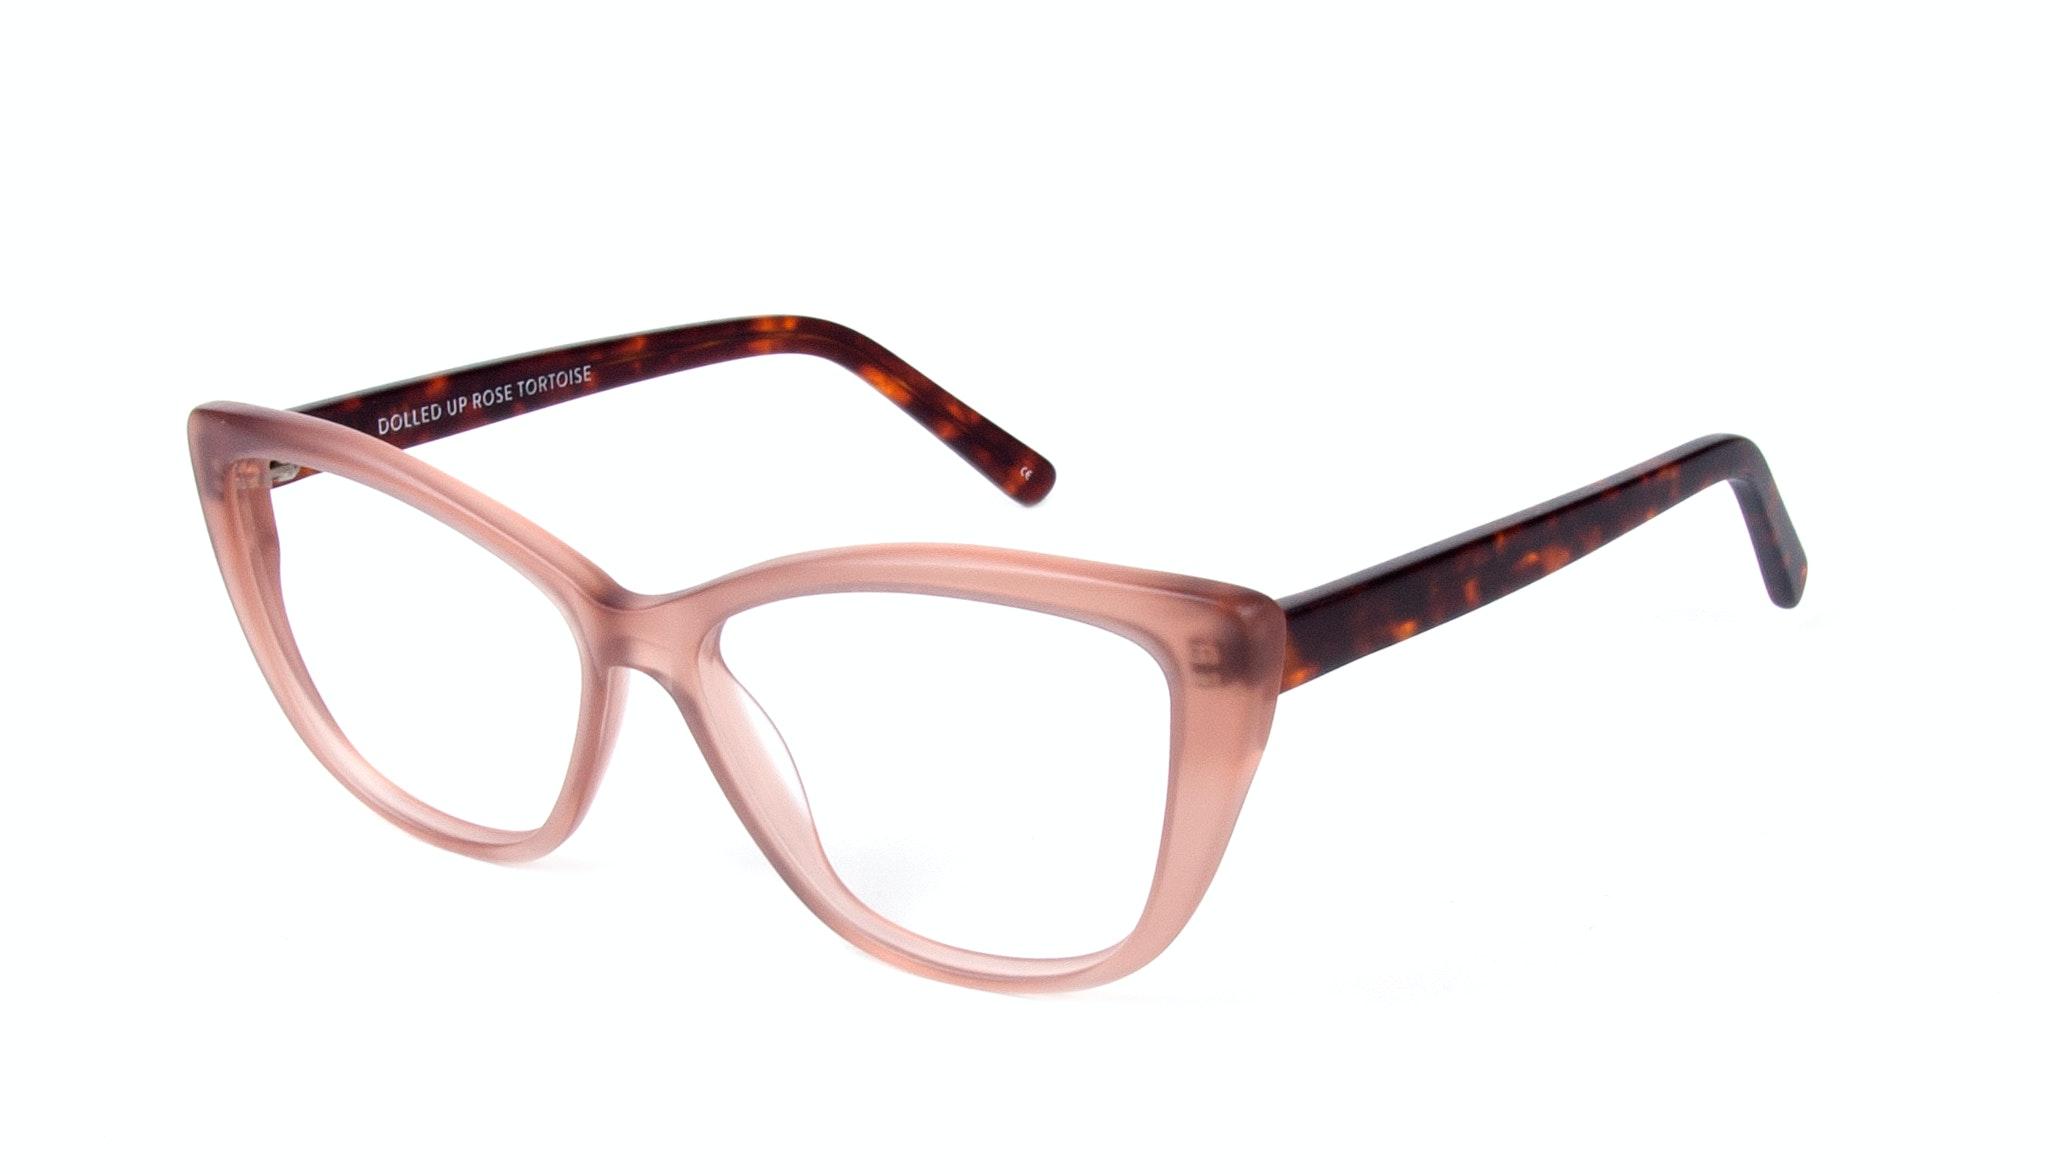 Affordable Fashion Glasses Cat Eye Eyeglasses Women Dolled Up Rose Tortoise Matte Tilt